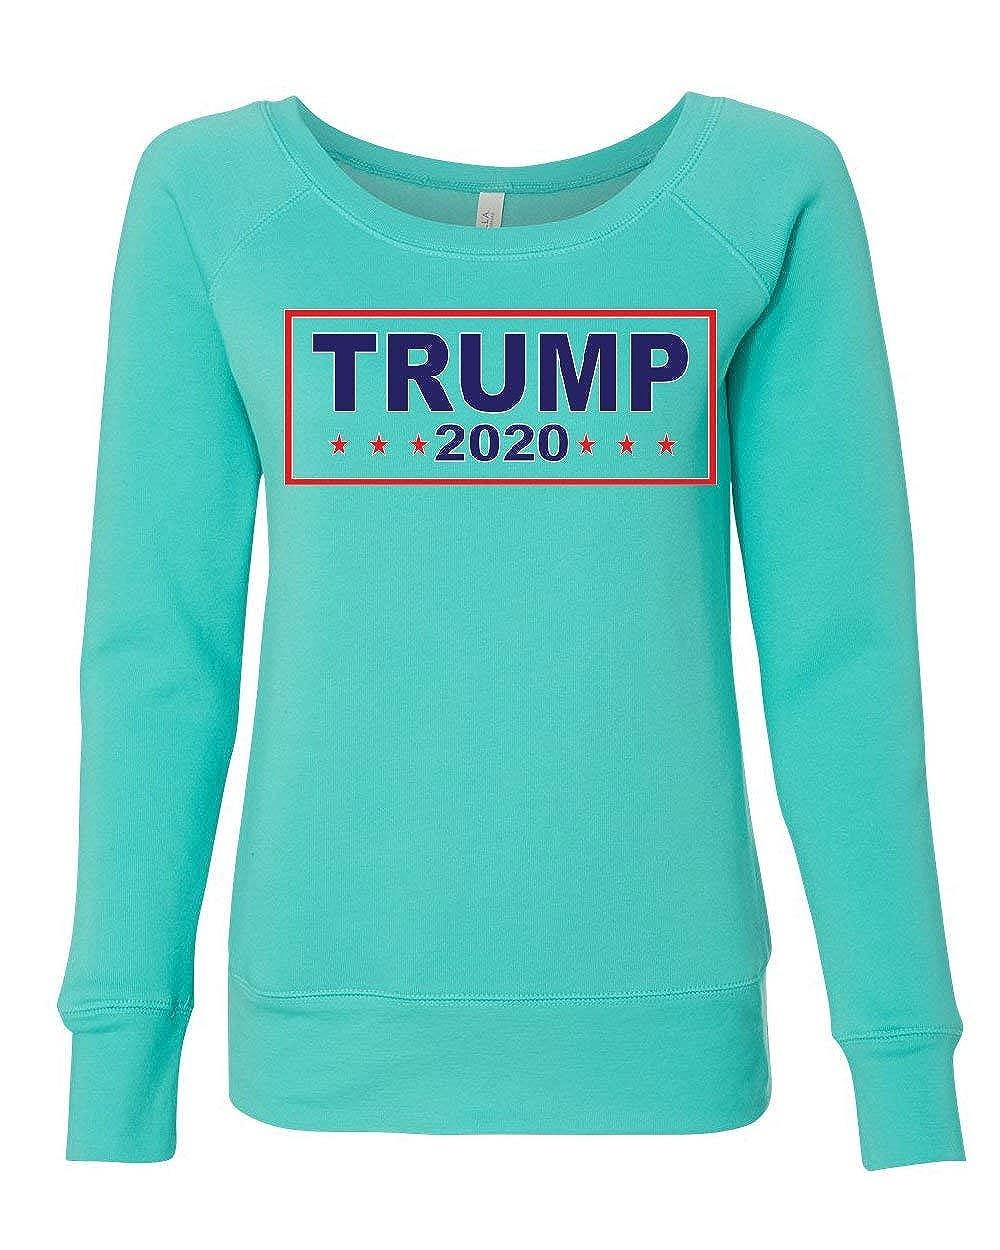 Donald Trump 2020 Womens Sweatshirt Conservative President MAGA Election